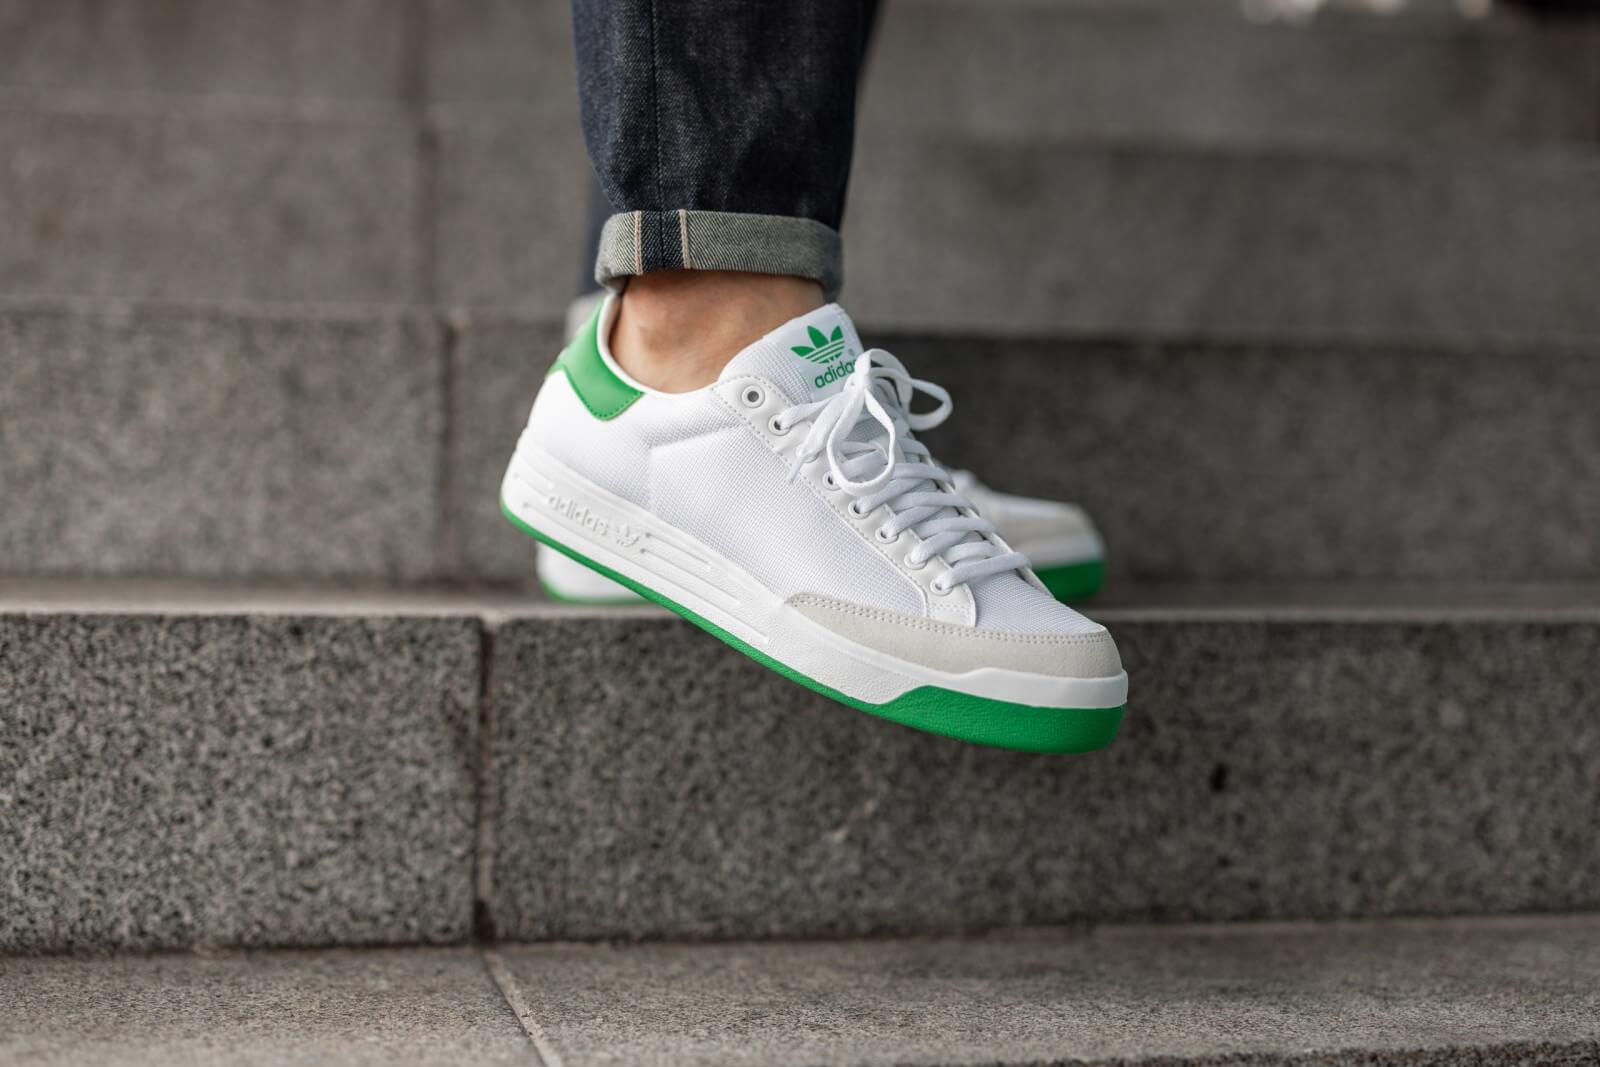 Adidas Rod Laver Cloud White/Green - G99863